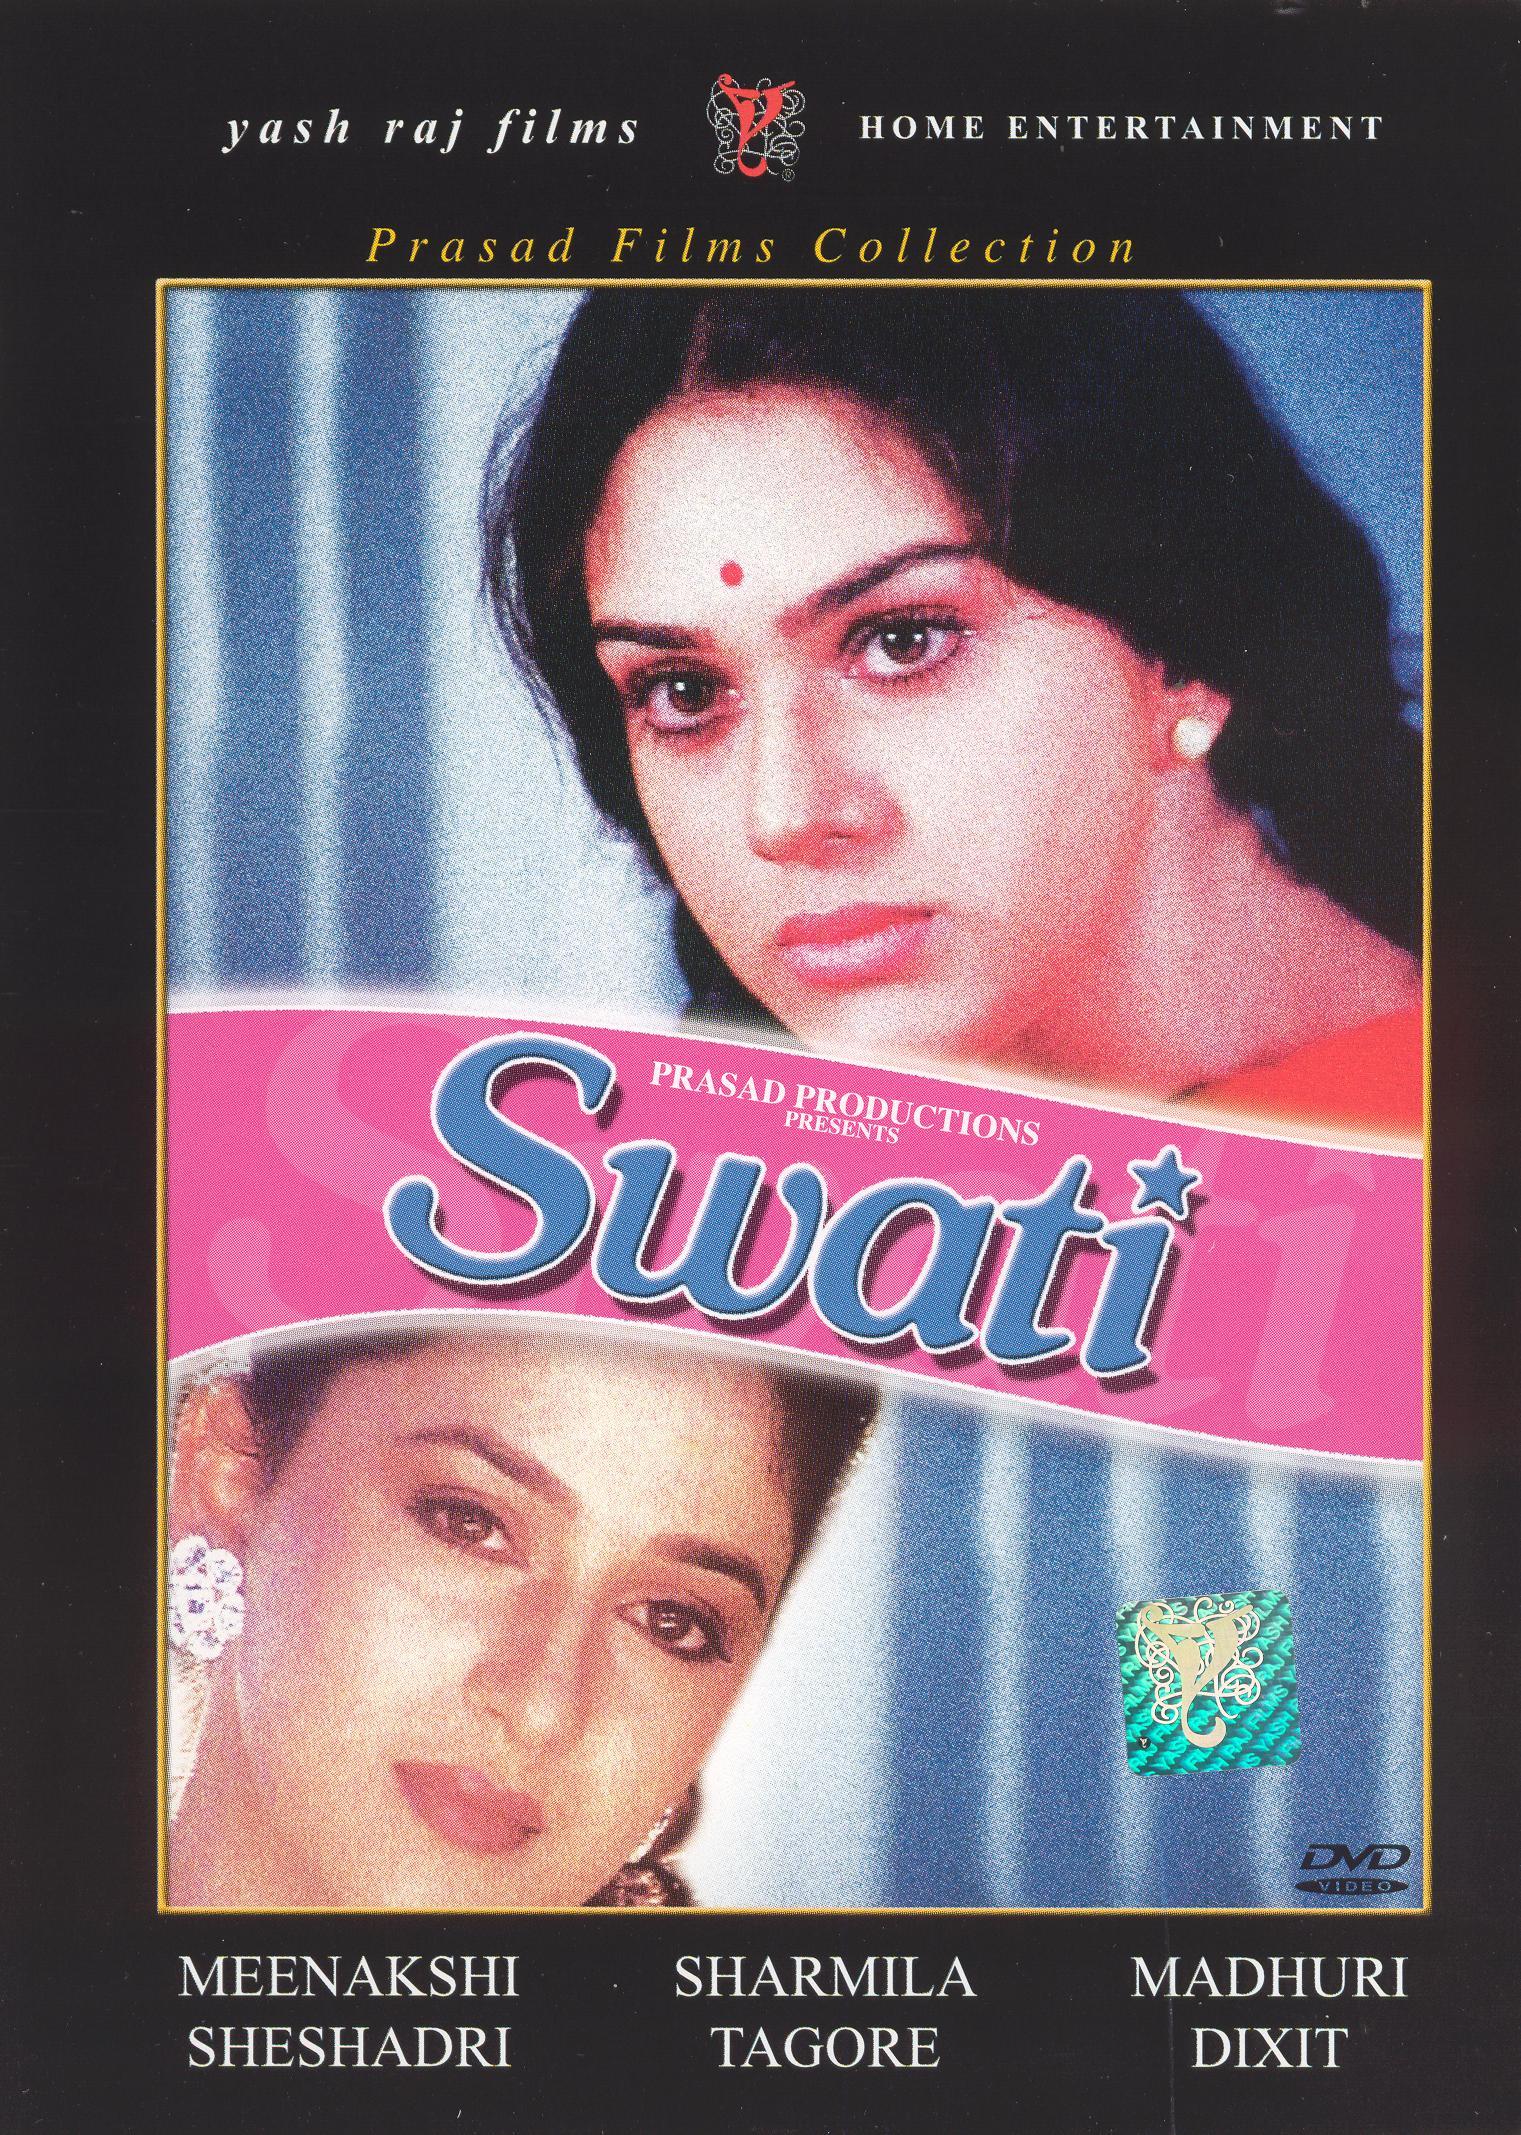 Dating a swati guy